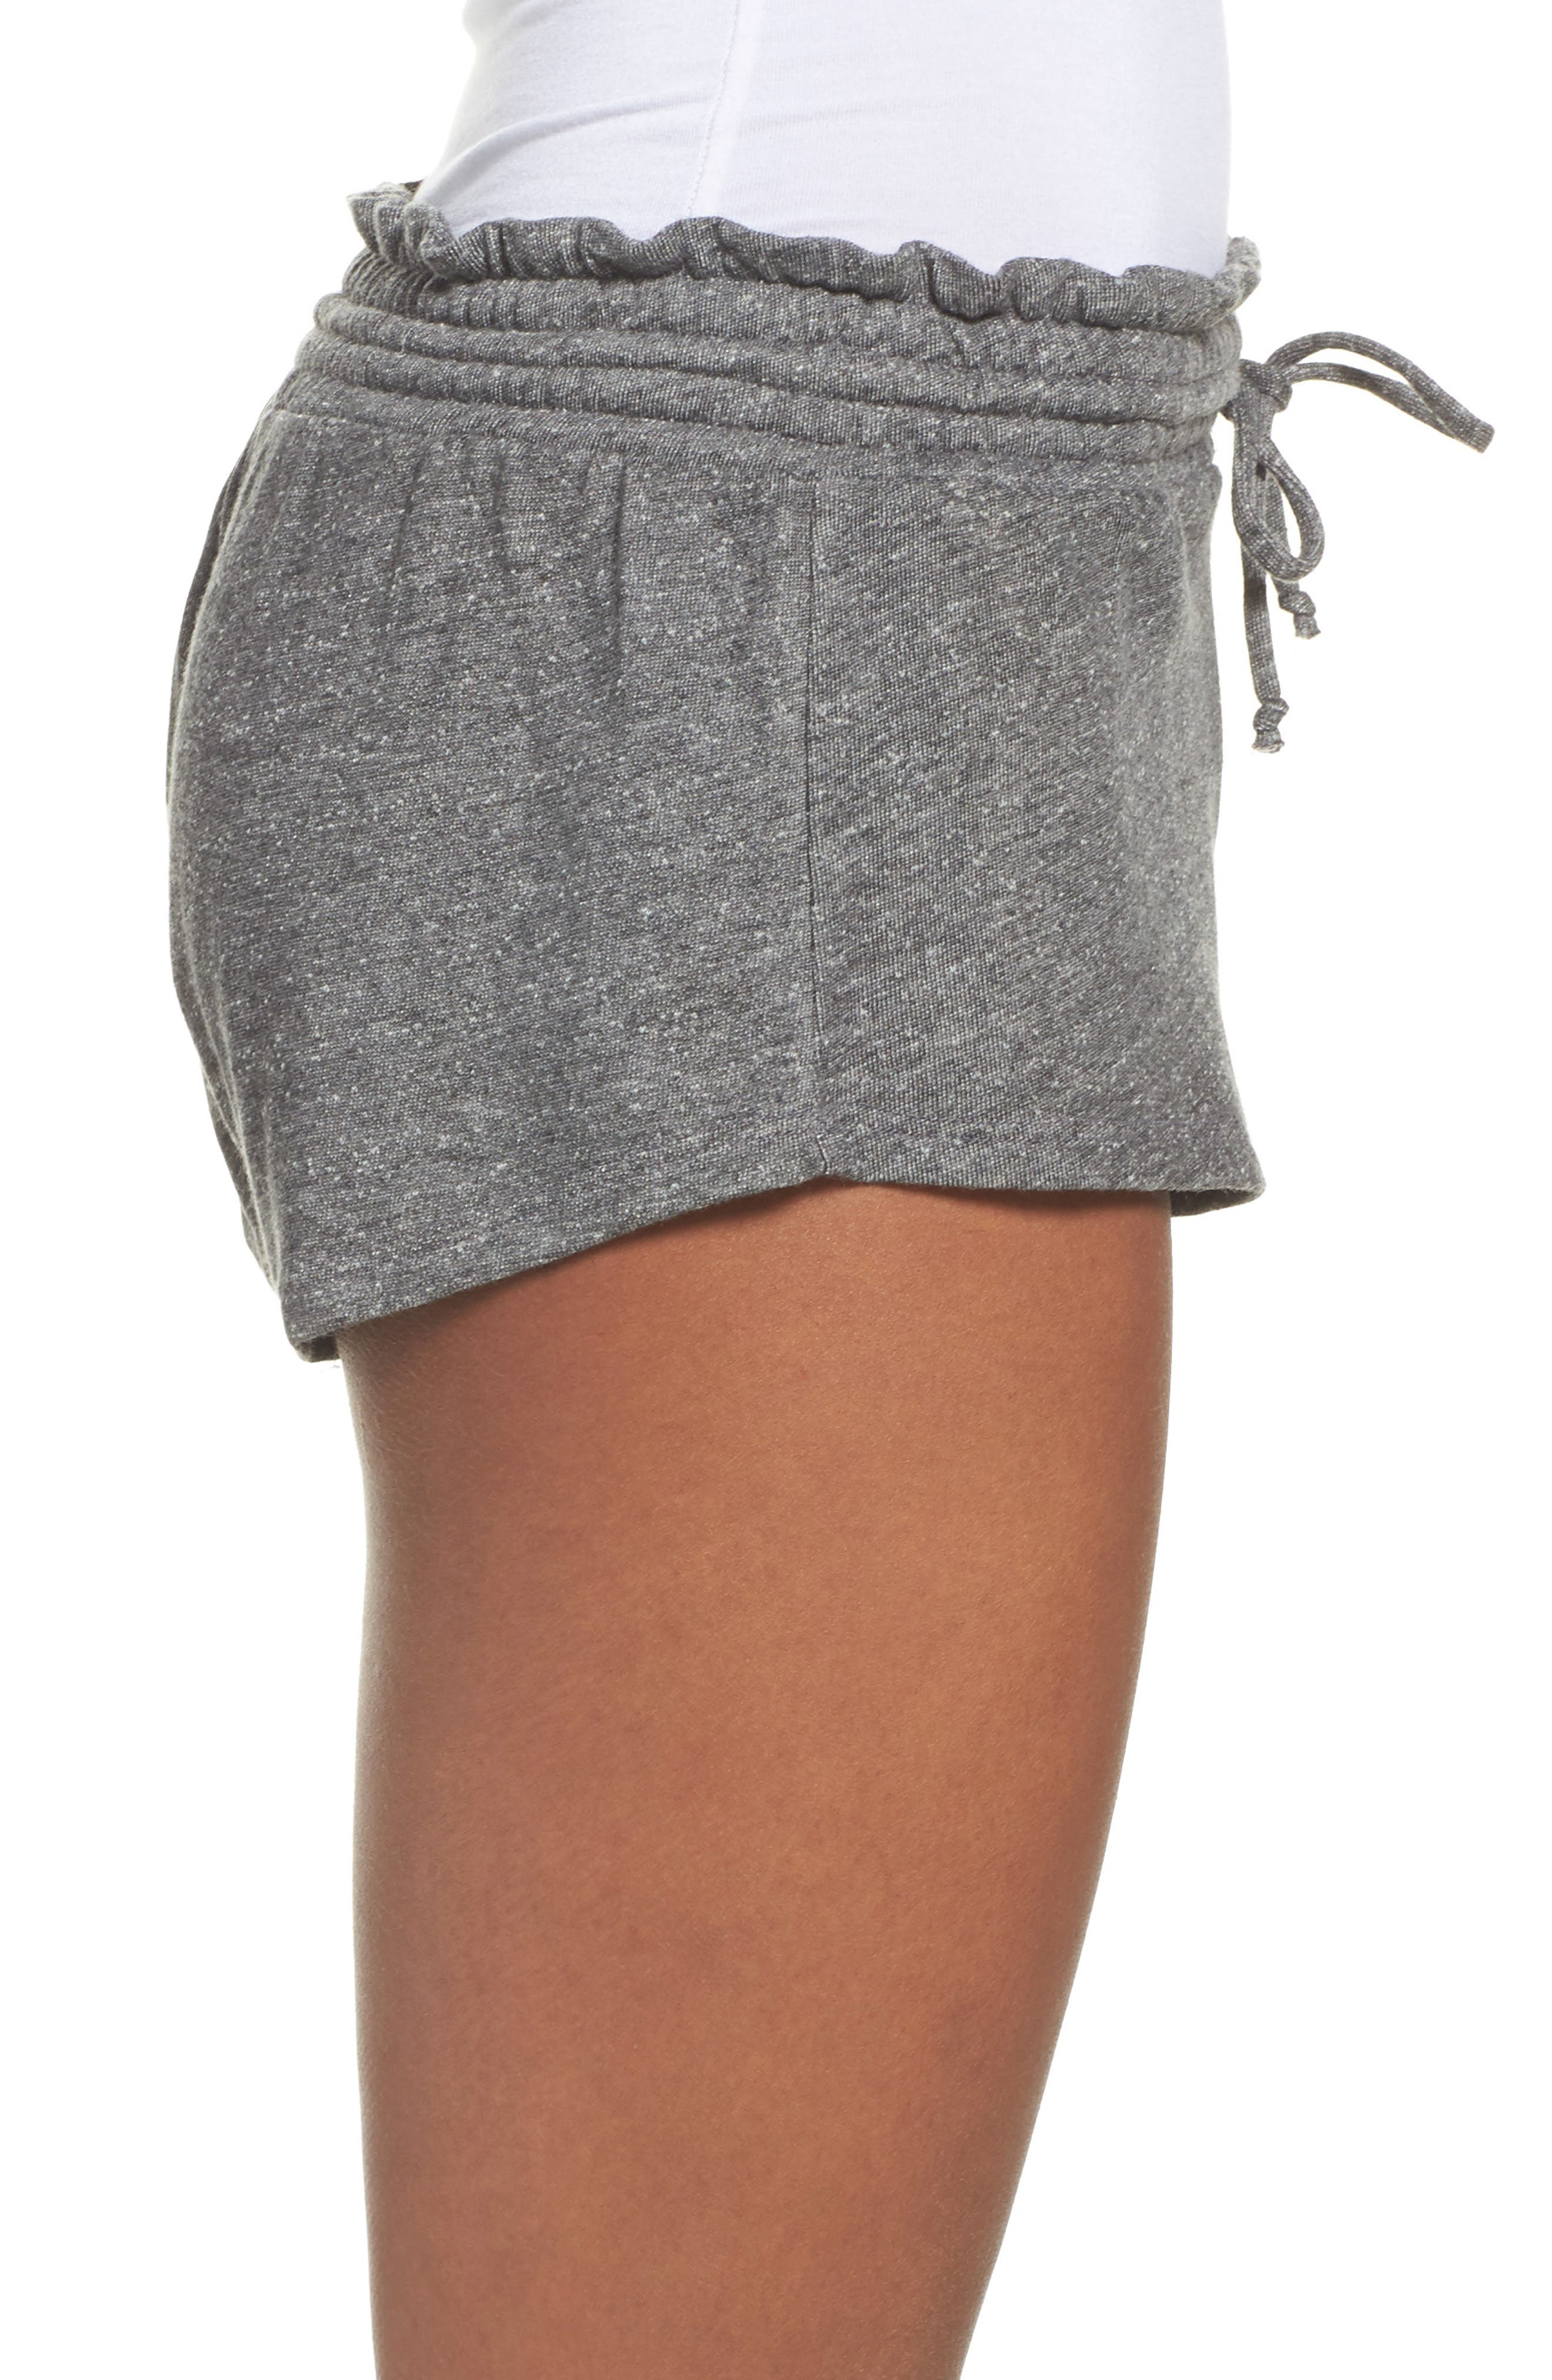 Alternate Image 3  - Olympia Theodora Dallas Shorts